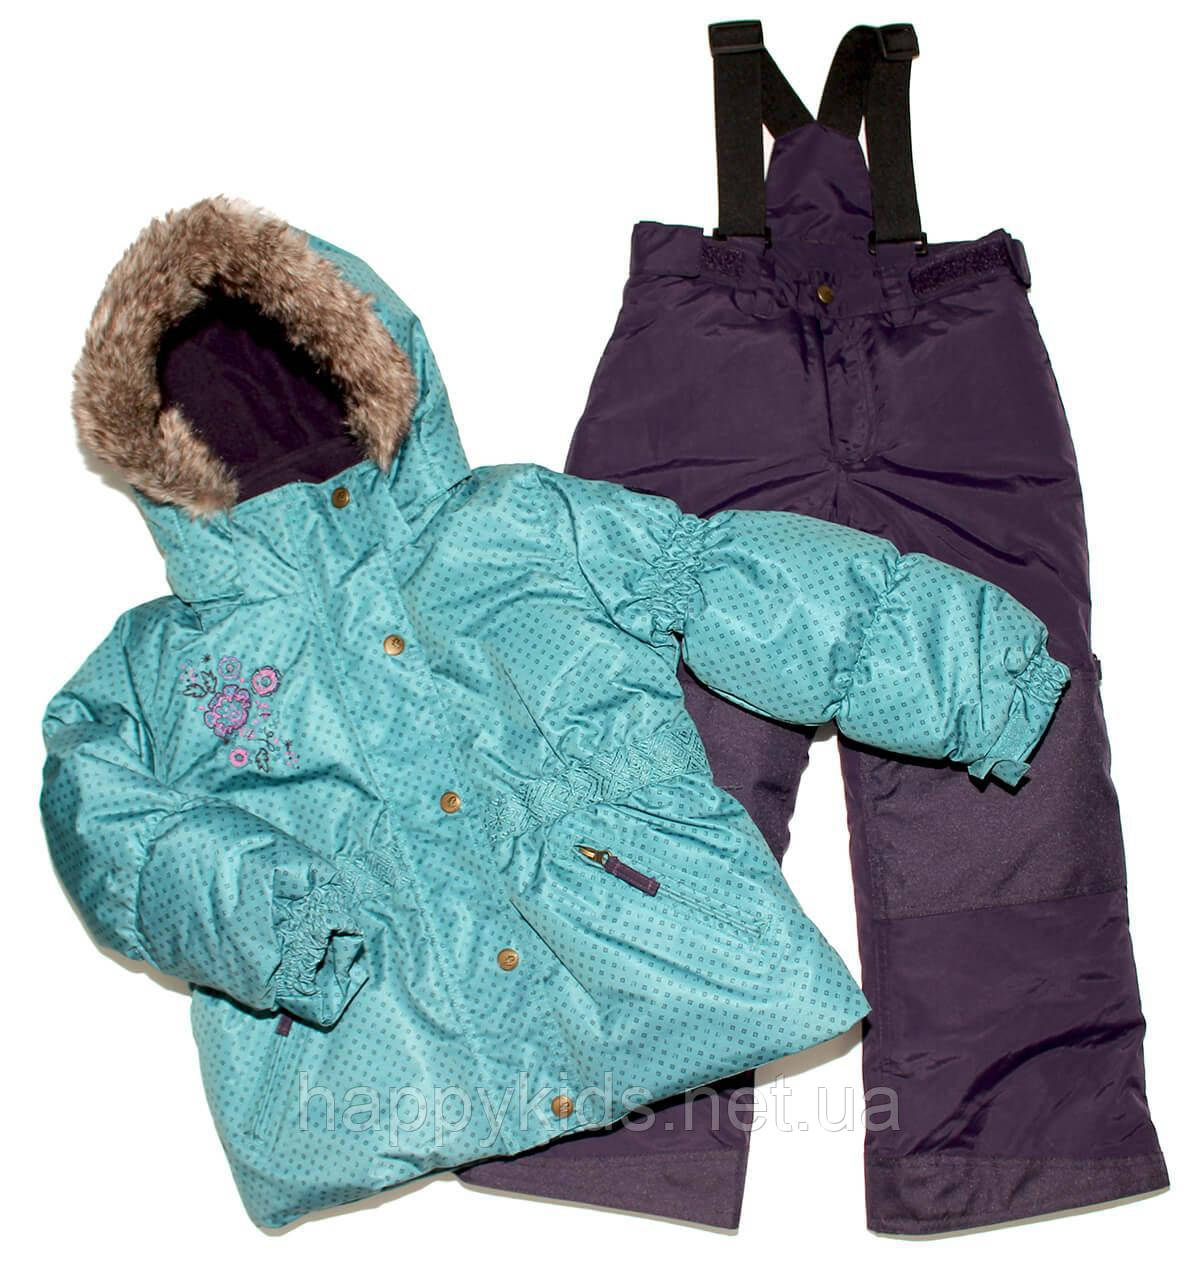 Зимний костюм для девочки PELUCHE F17 M 52 EF New Reef / Grape. Размеры 96 - 128.